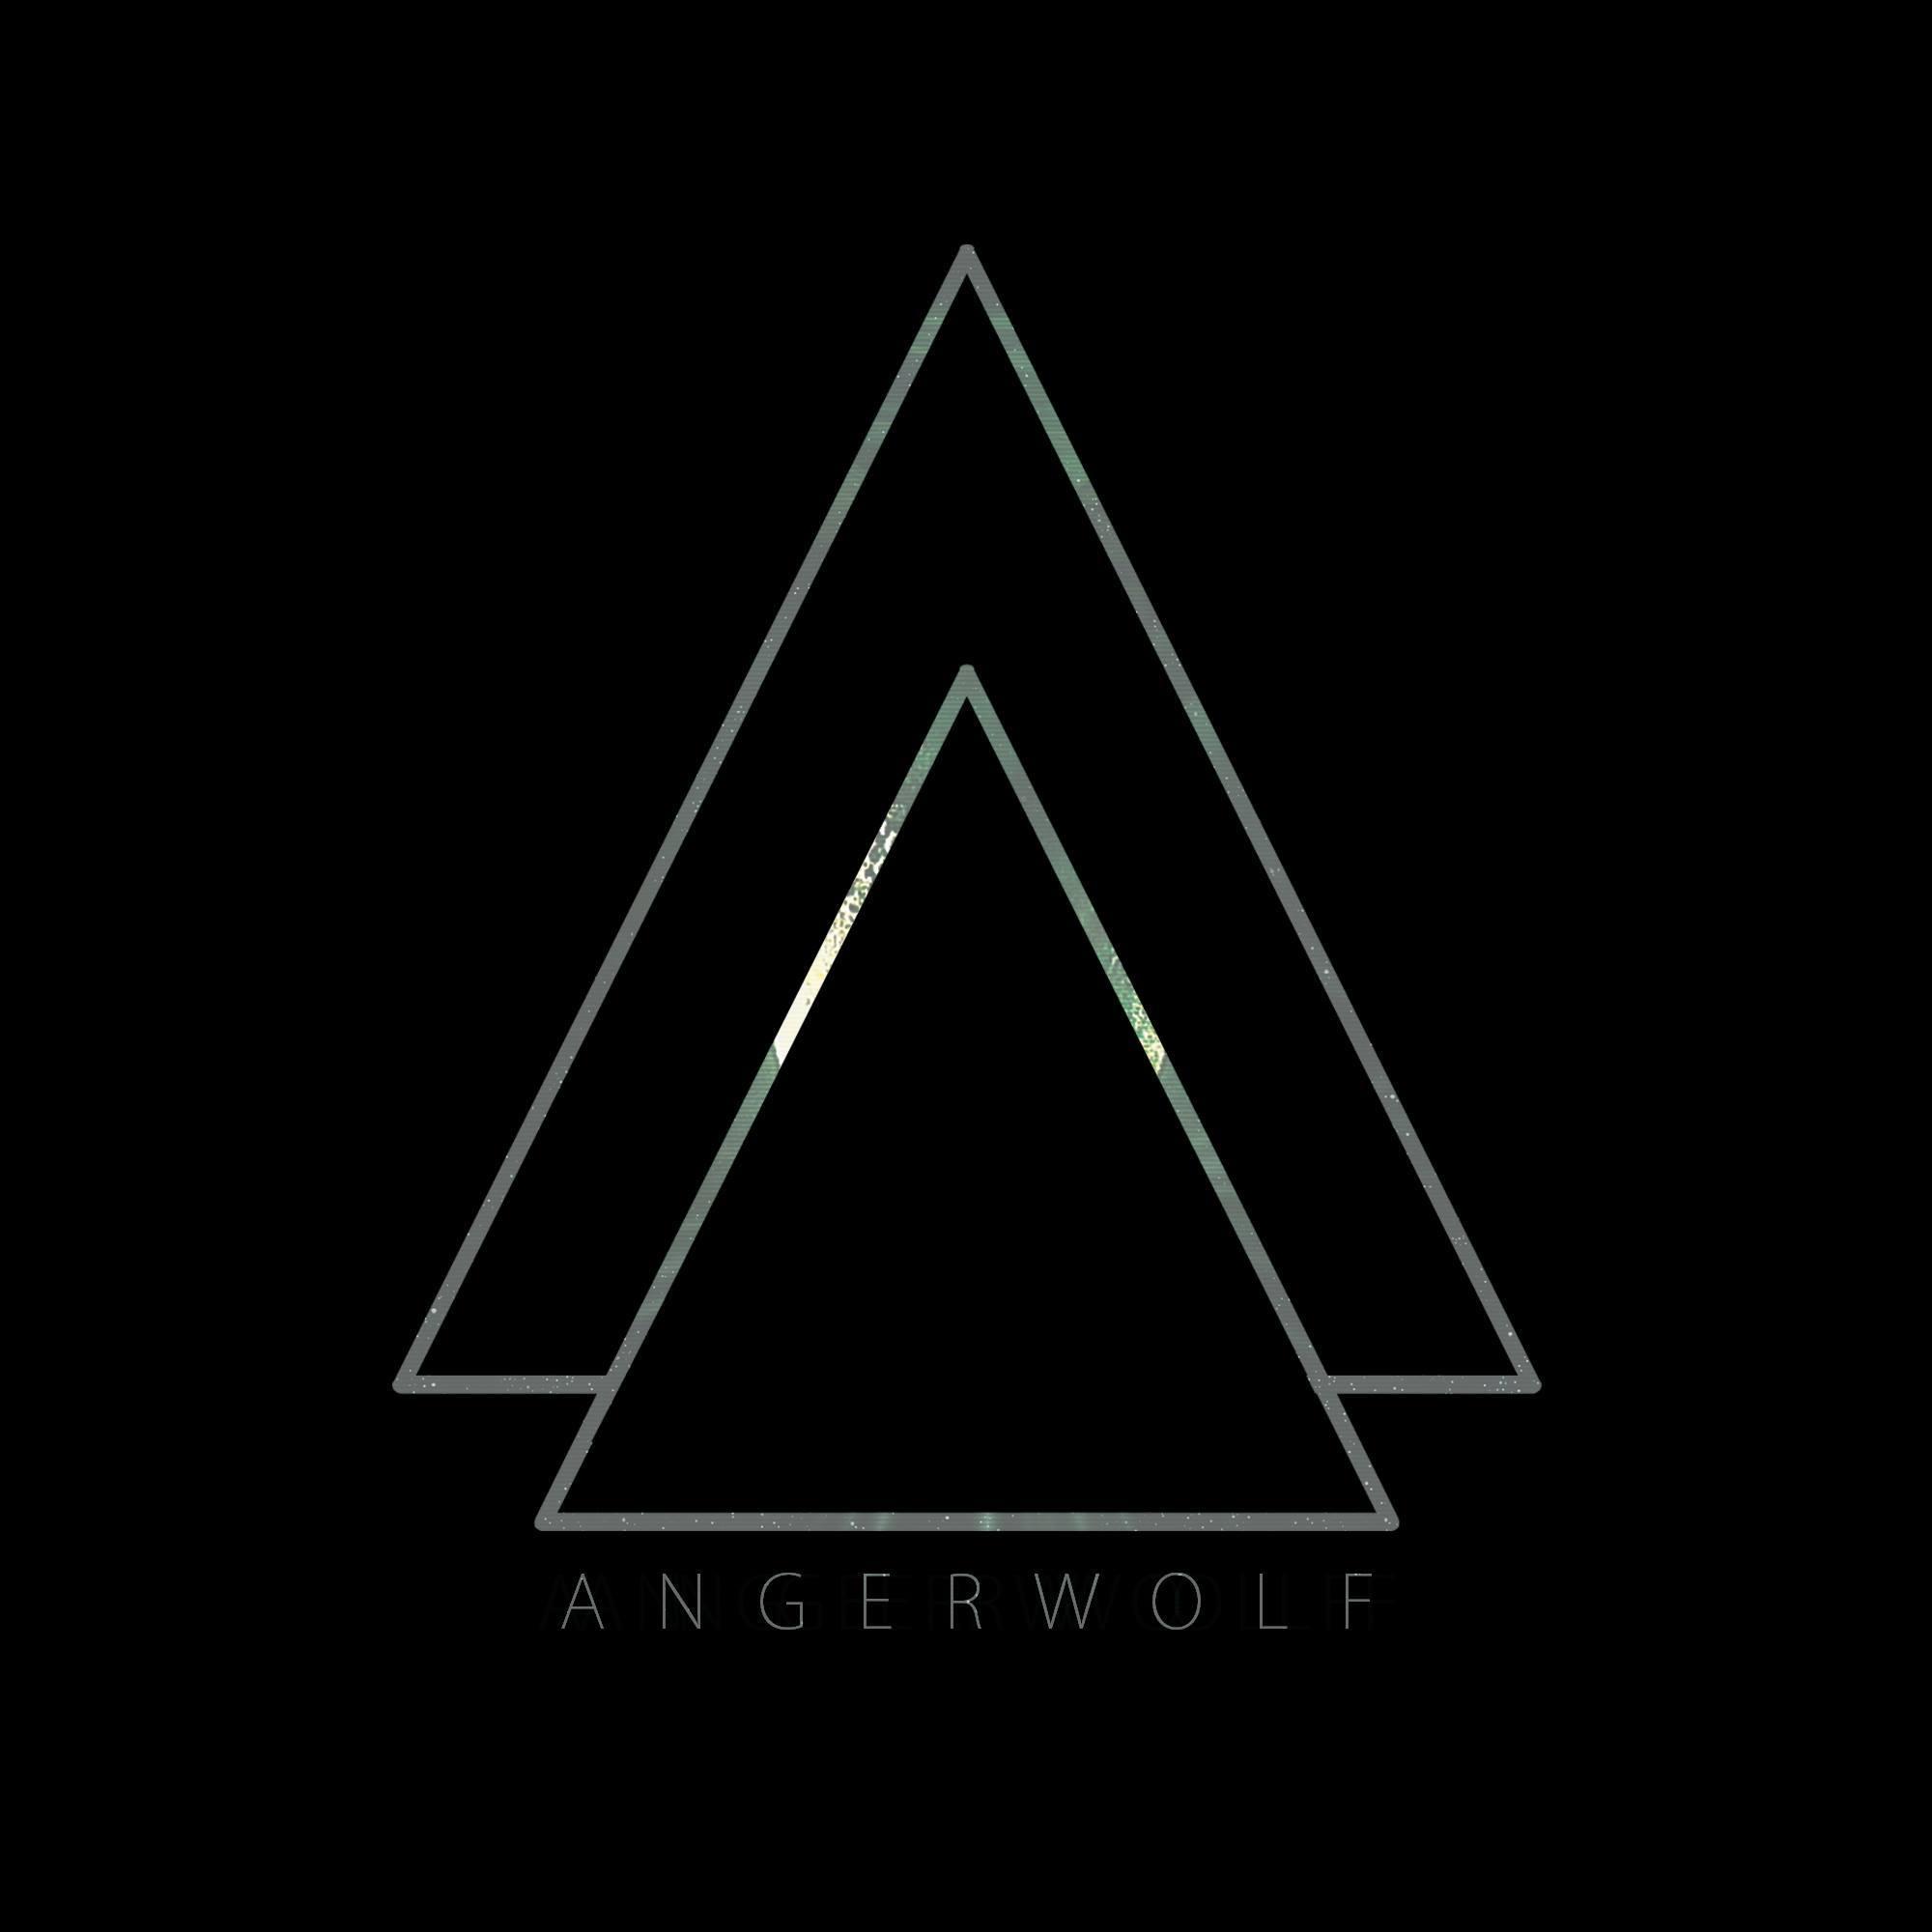 angerwolf